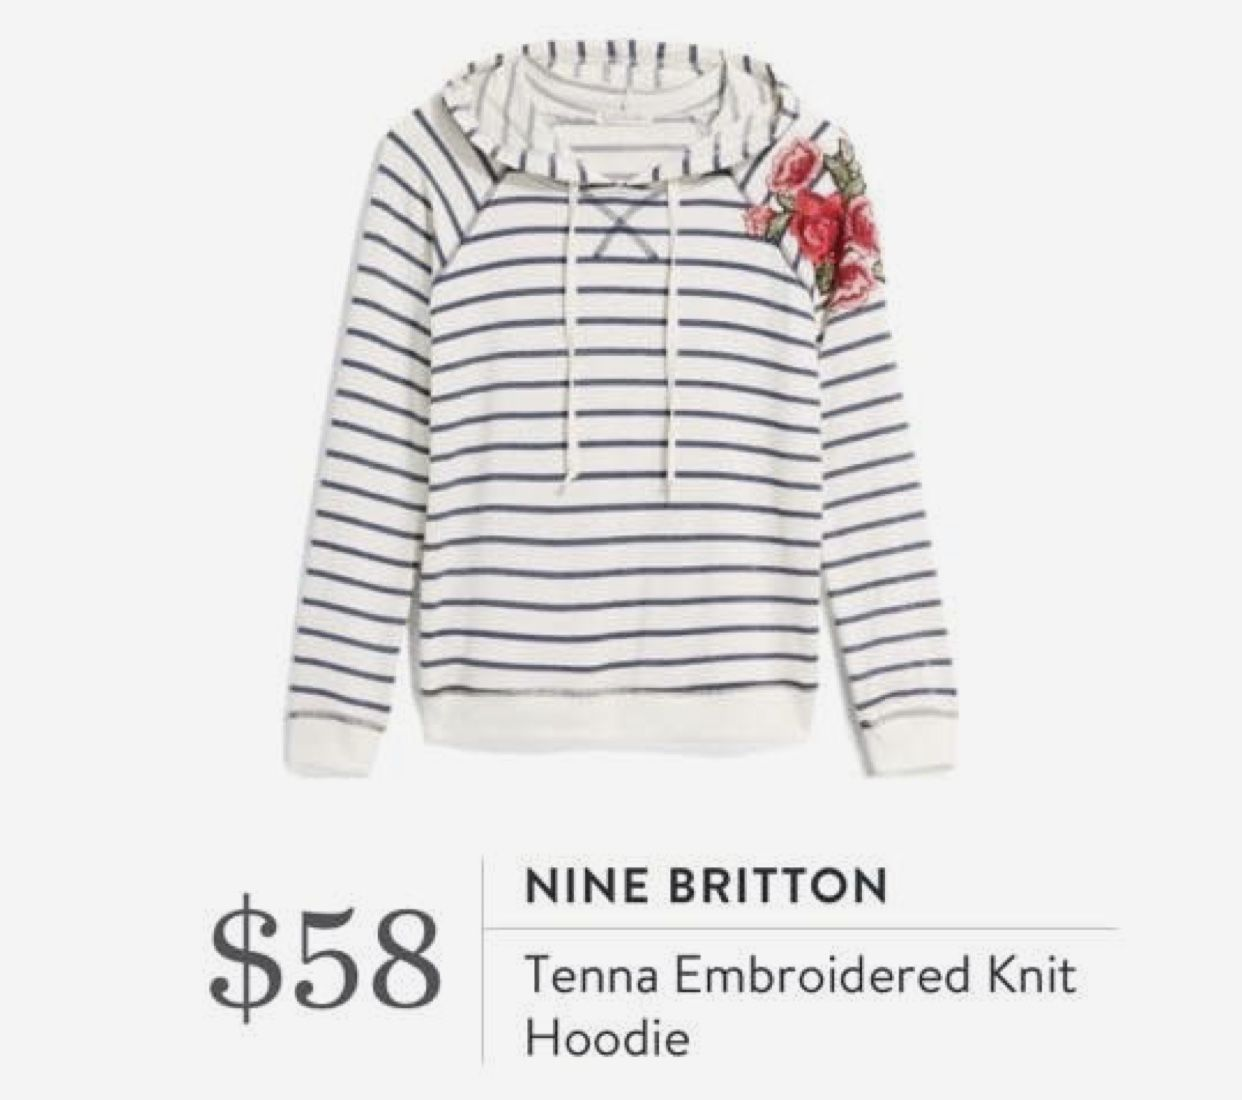 stitch fix sweatshirt nine britton tenna embroidered knit hoodie Source by Myfavehello outfit